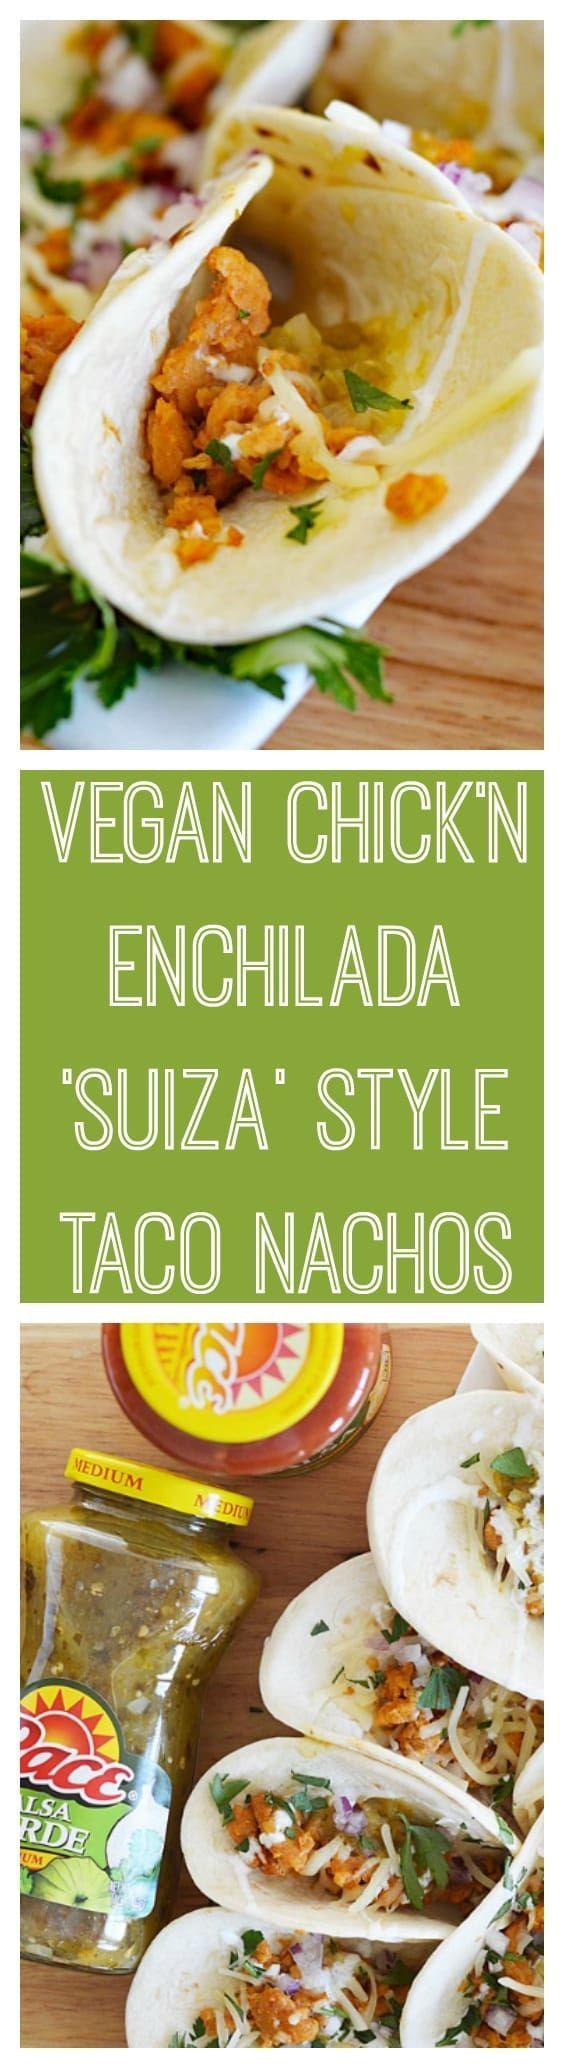 "#ad NEW #ontheblog - VEGAN CHICK'N ENCHILADAS ""SUIZA""STYLE TACO NACHOS - get the recipe here ➡️ http://theveglife.com/vegan-chicken-enchiladas-suiza-style-taco-nachos/ #MakeGameTimeSaucy #gameday #enchiladas @pacesalsaandsauces @walmart #pacesalsa #vegan #veganlife #veganrecipes #vegetarian #vegetarianrecipes #recipe #recipes #veganfood #vegansofig #veganfoodshare"